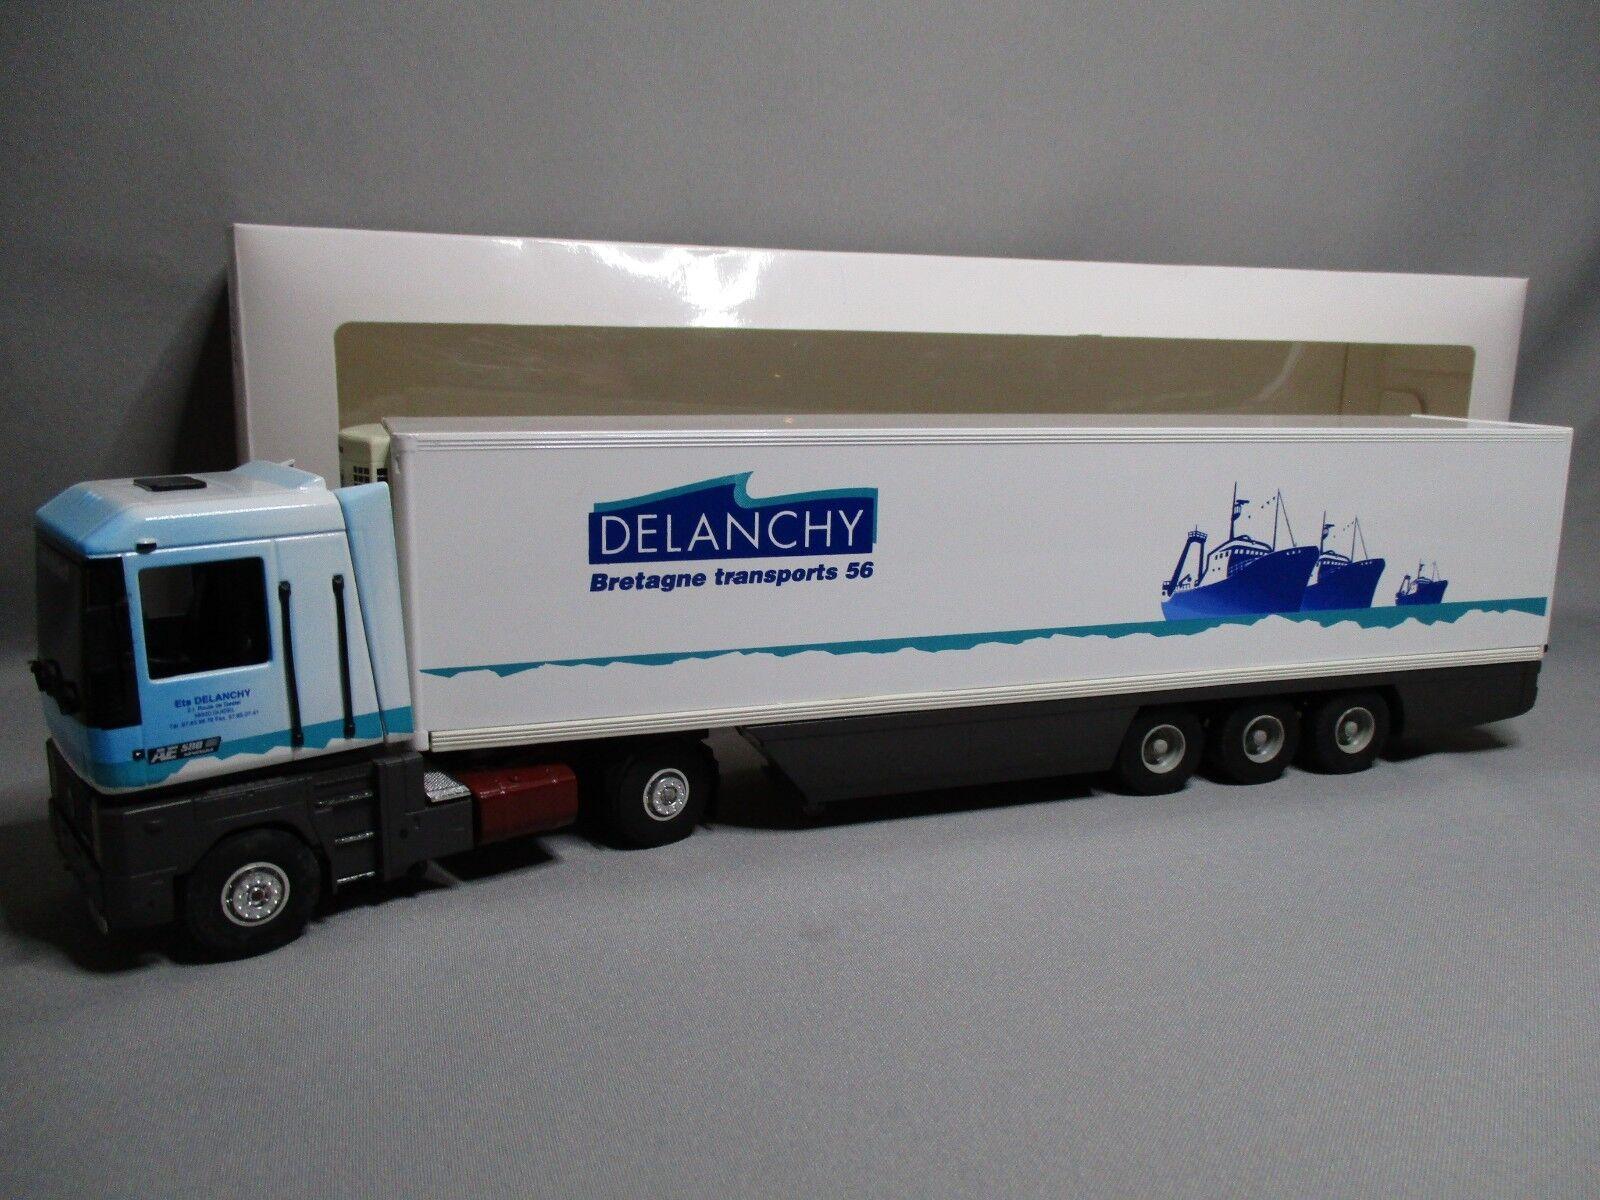 DV8025 ELIGOR 1 43 RENAULT AE 500 DELANCHY BRETAGNE TRANSPORTS 56 110796 RARE